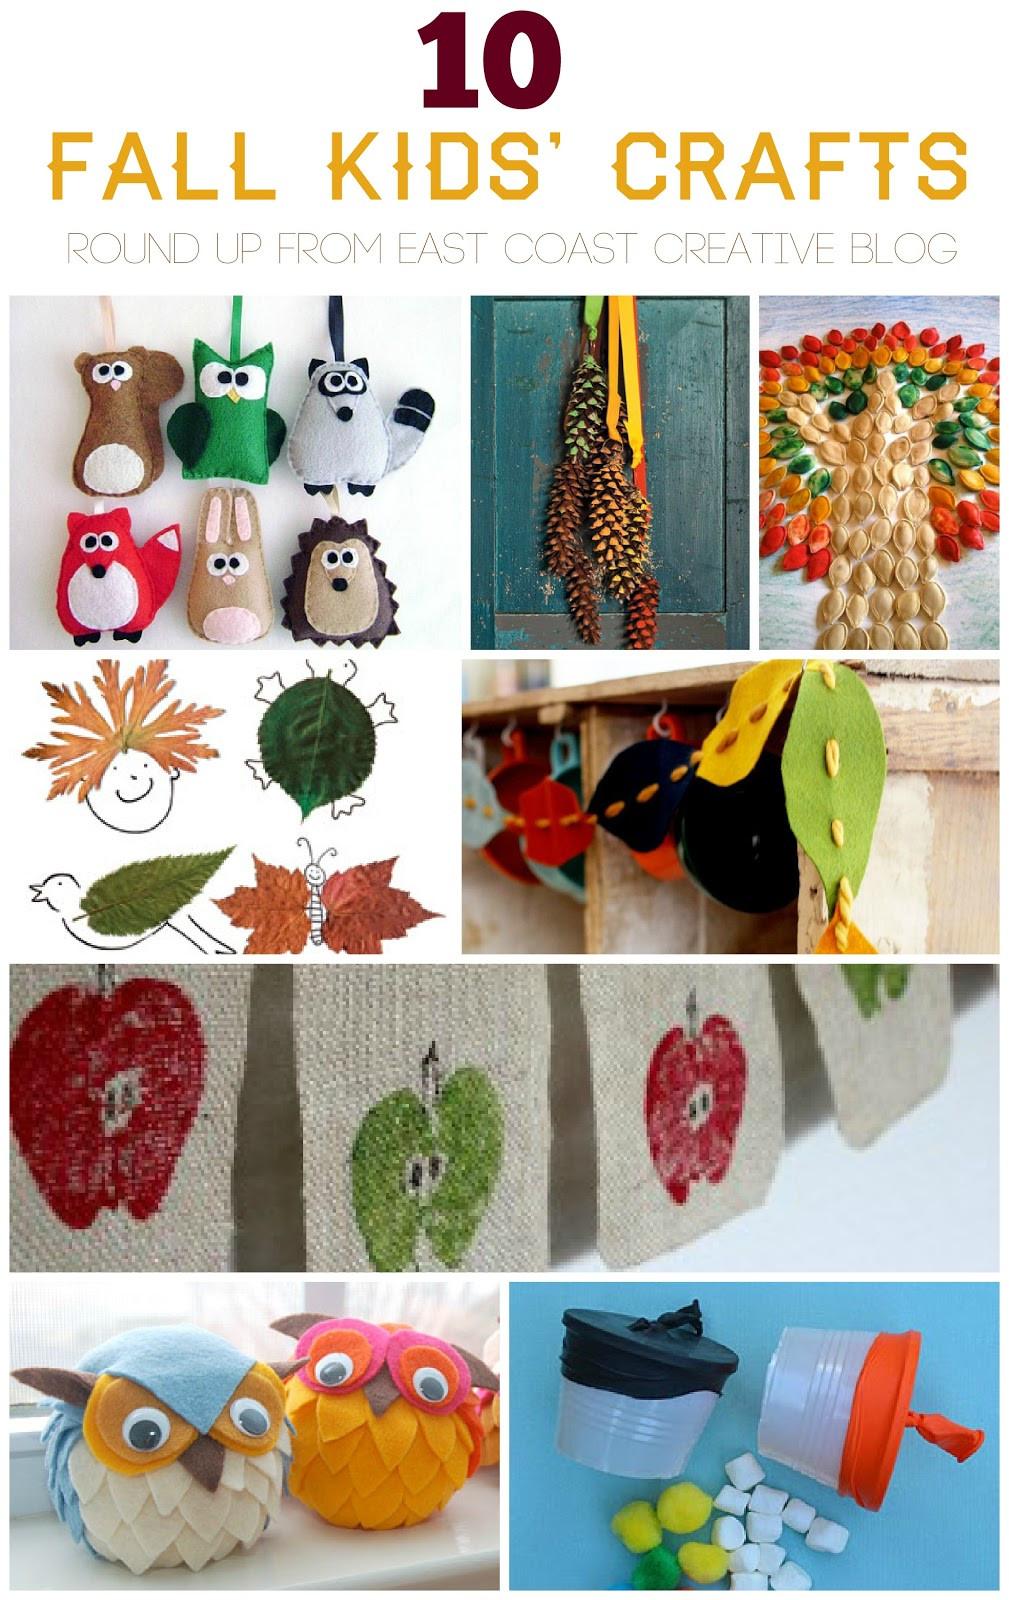 Fall Crafts Ideas For Kids  10 Fall Kids Crafts